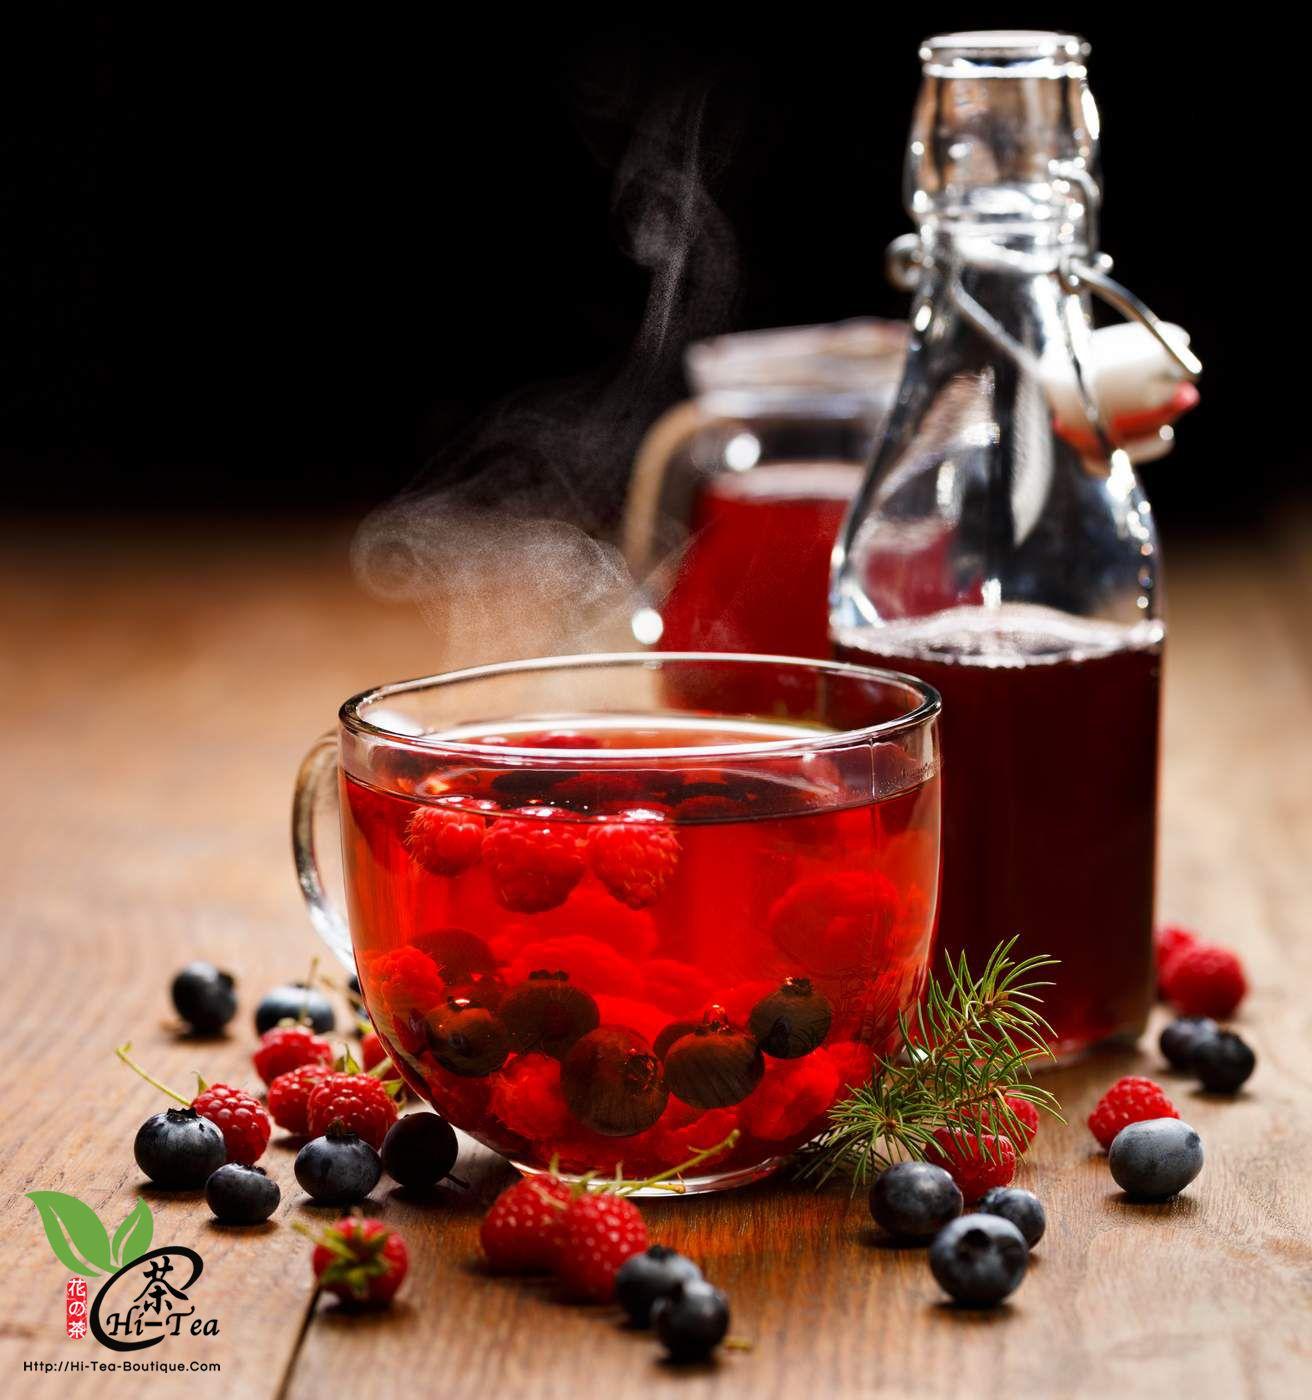 Blueberry Fruit Tea   蓝莓果粒茶 Ingredients: Hibiscus, Rose